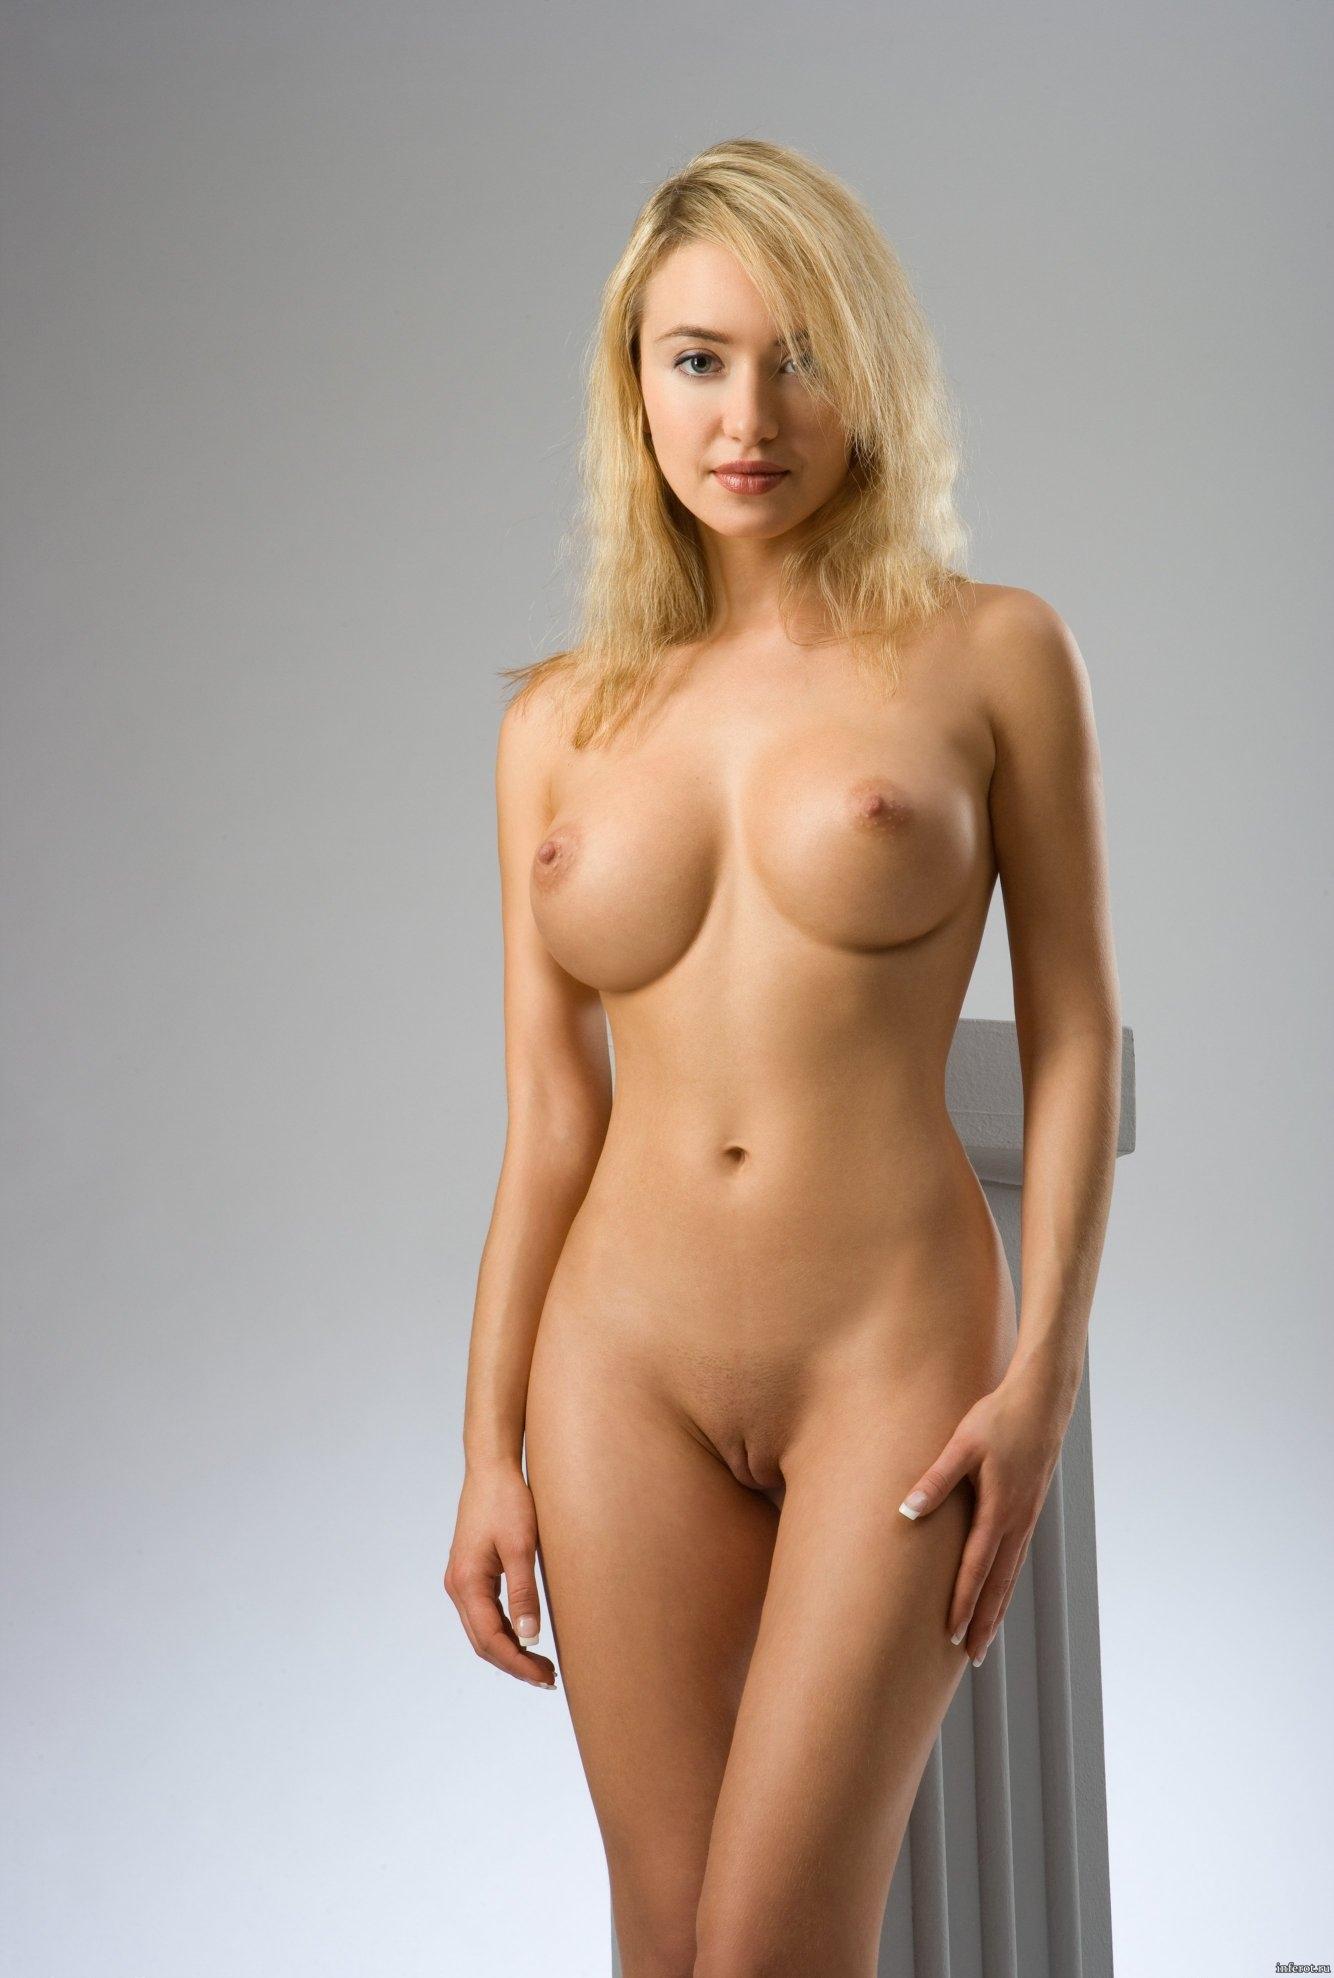 tania mallet sex nude photo